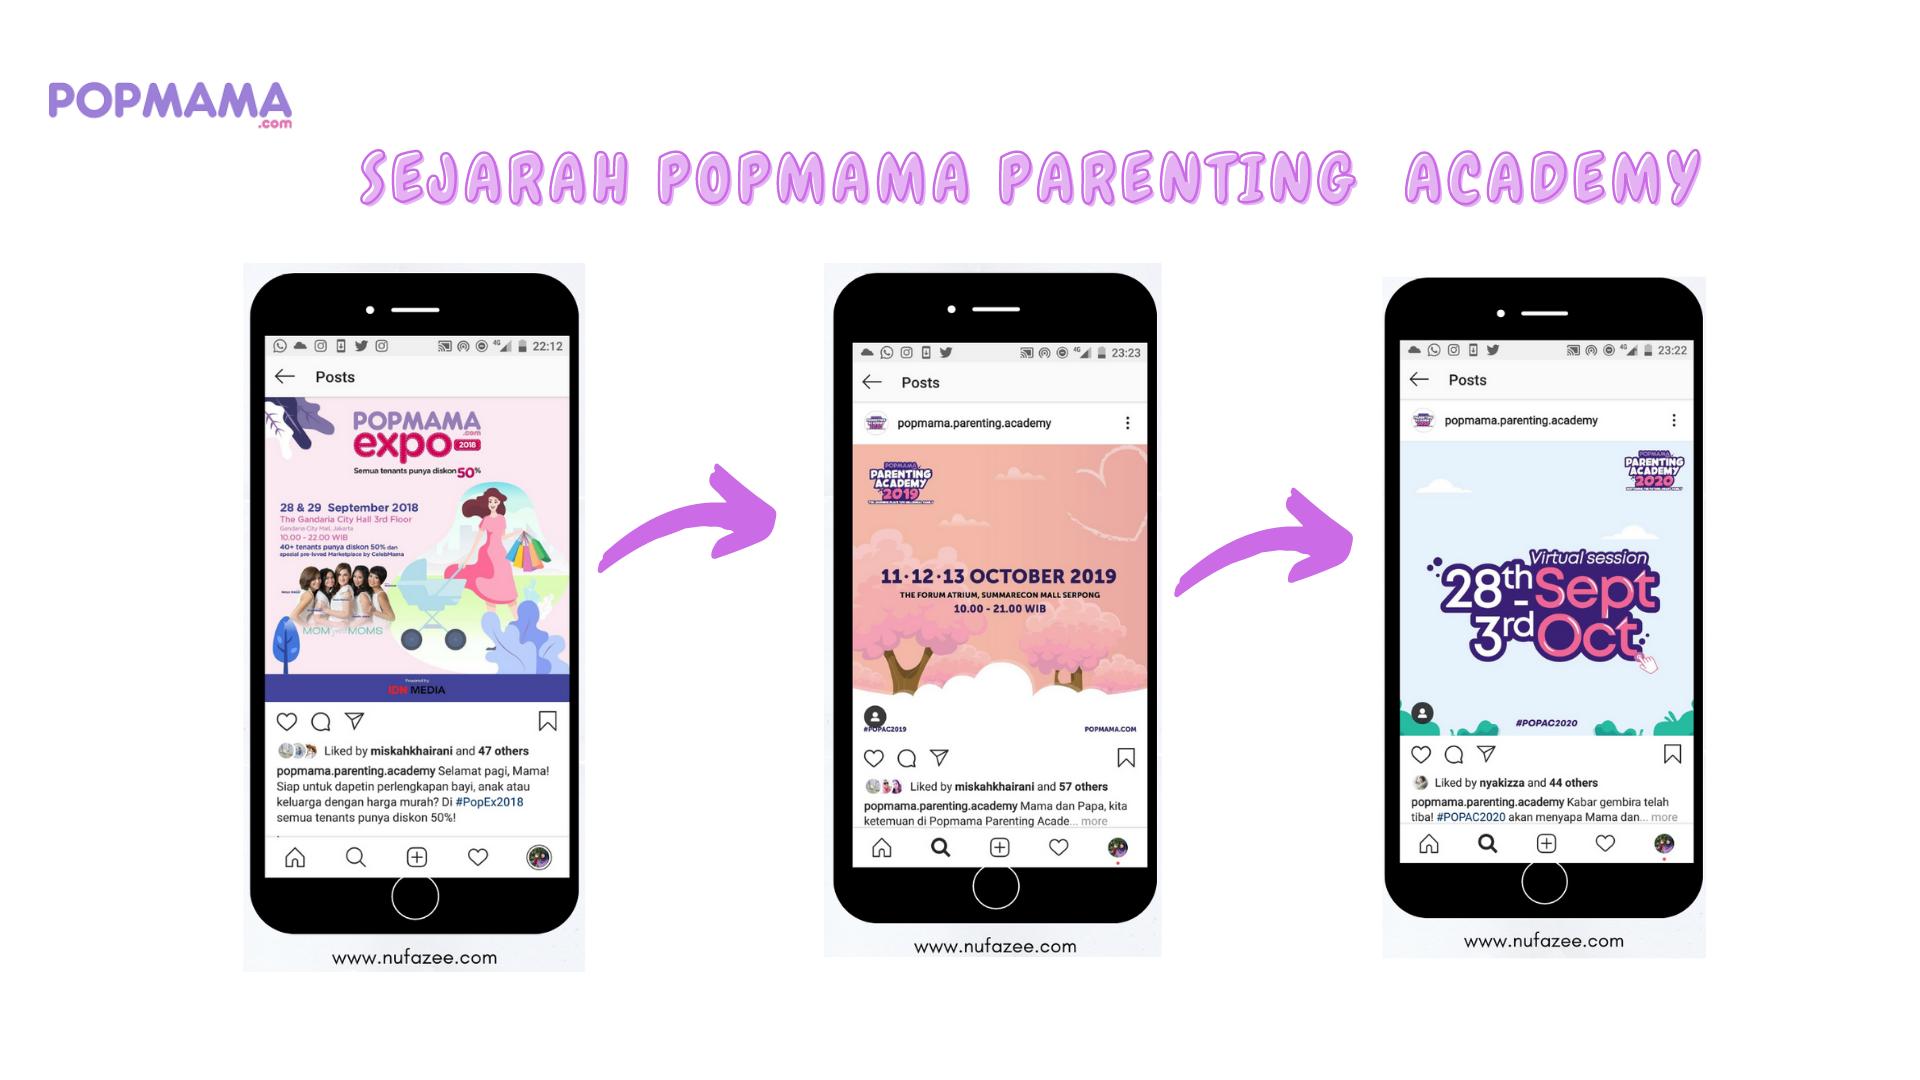 Sejarah Popmama Parenting Academy